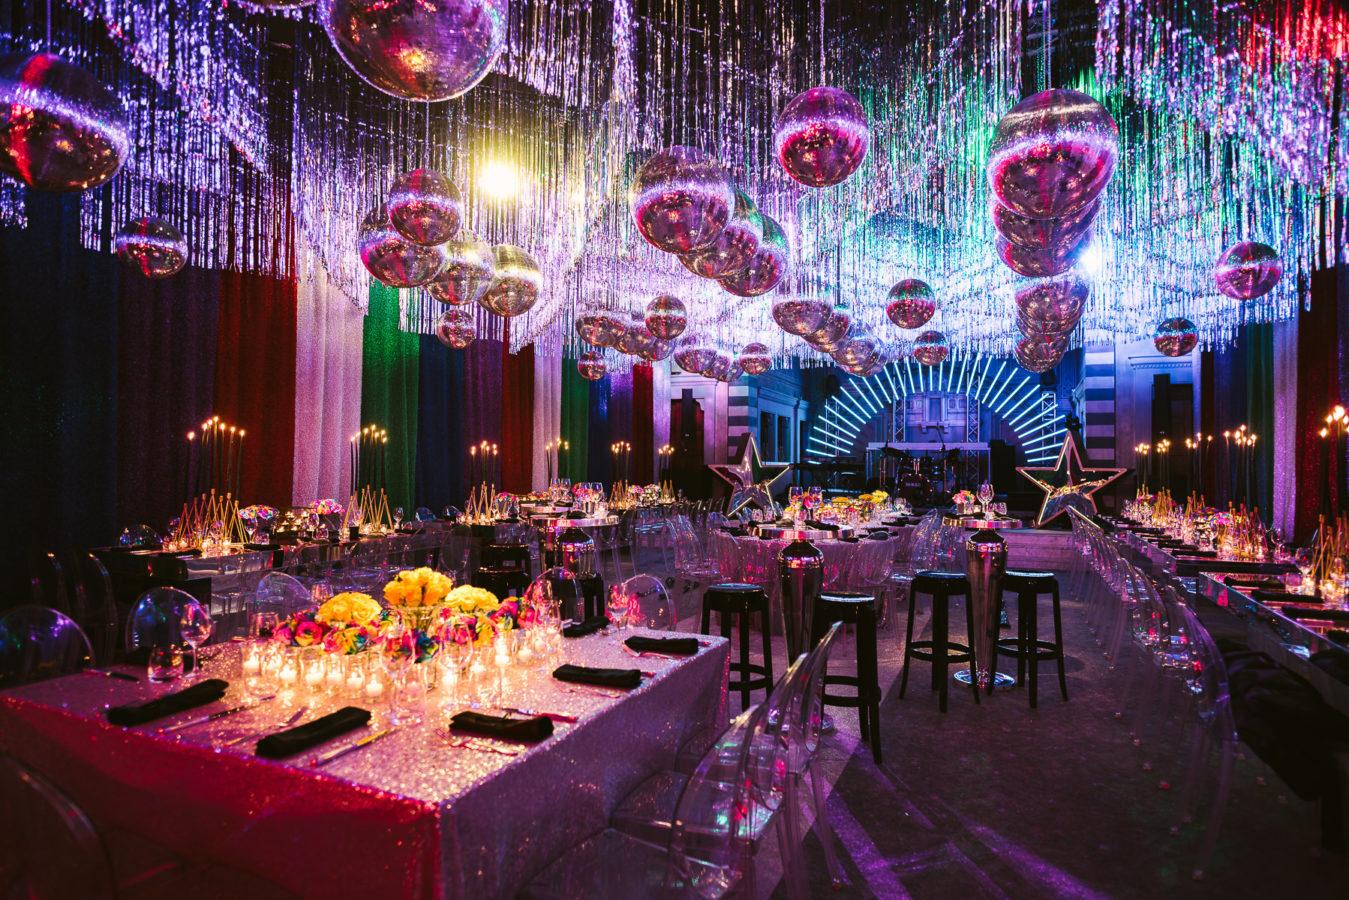 017-Hotel-four-seasons-florence-new-year-luxury-event-setup